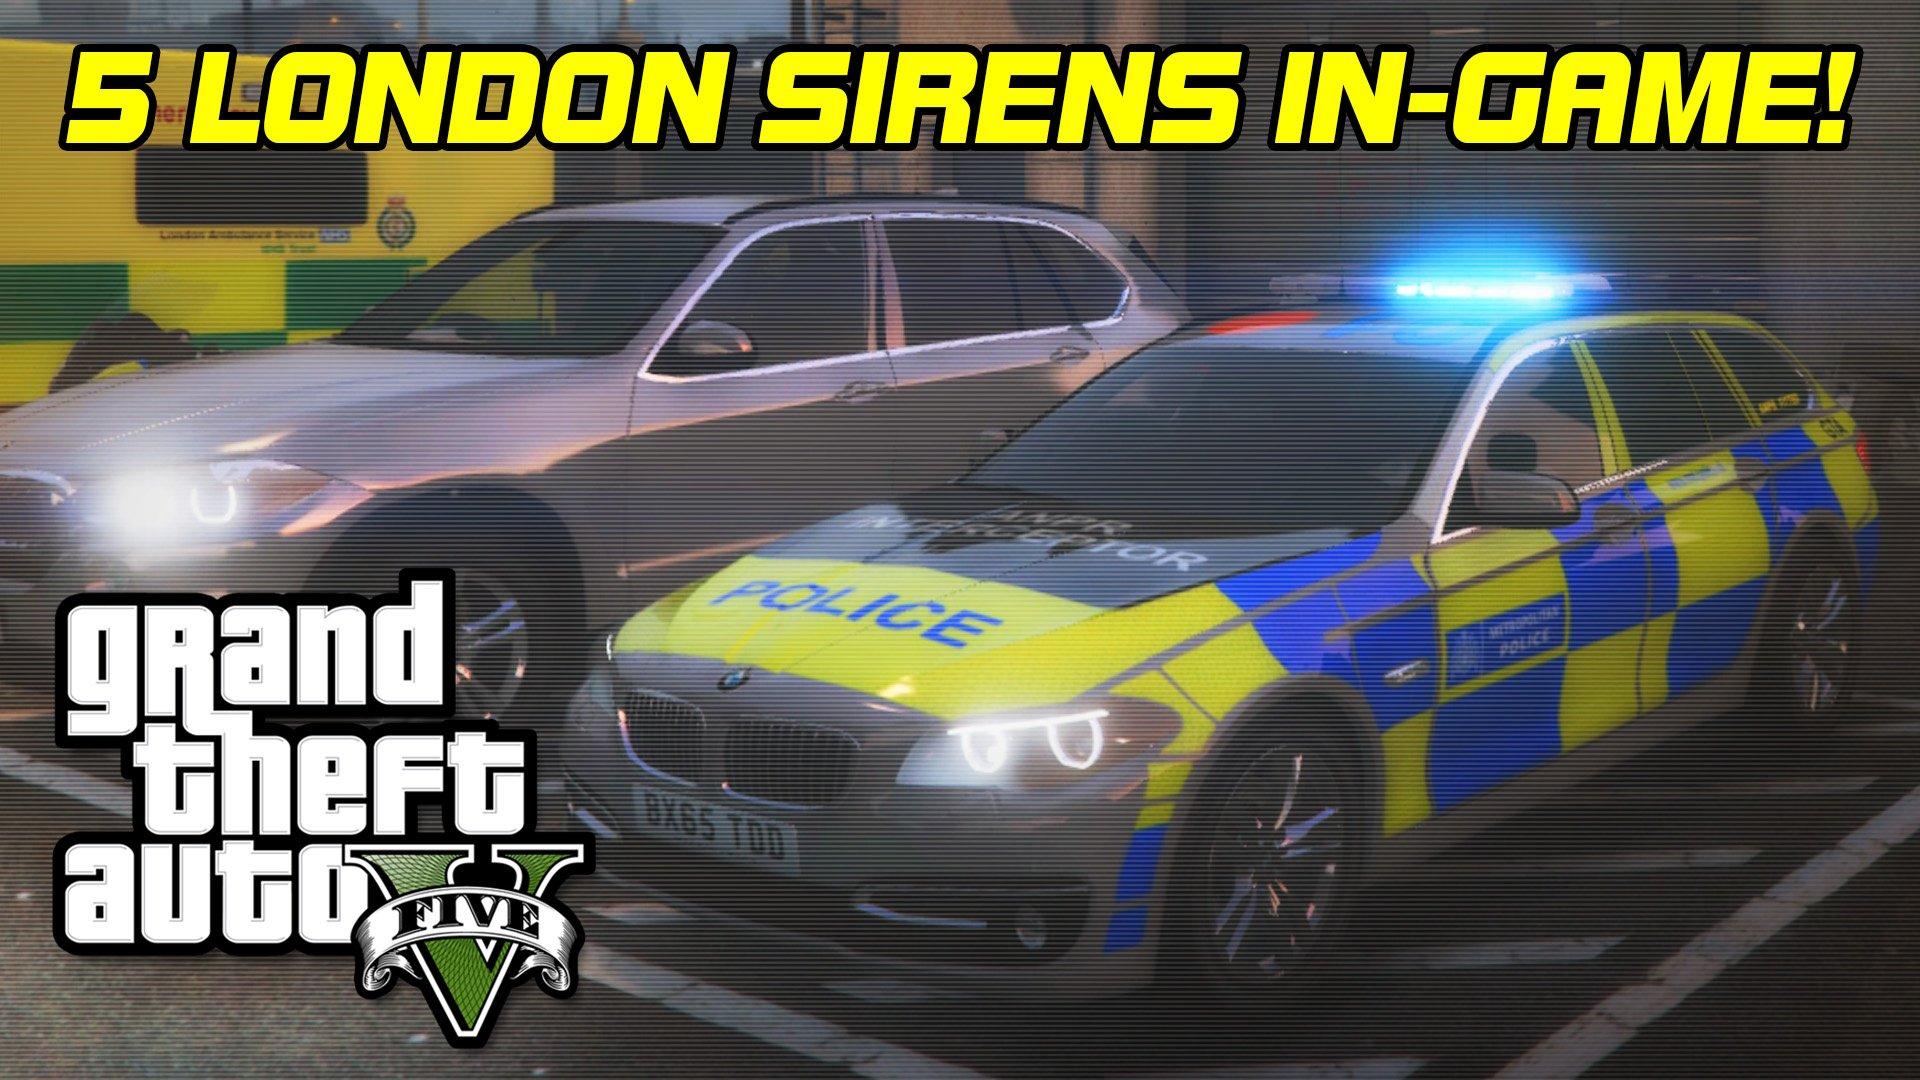 6d2f55-London Sirens Mod